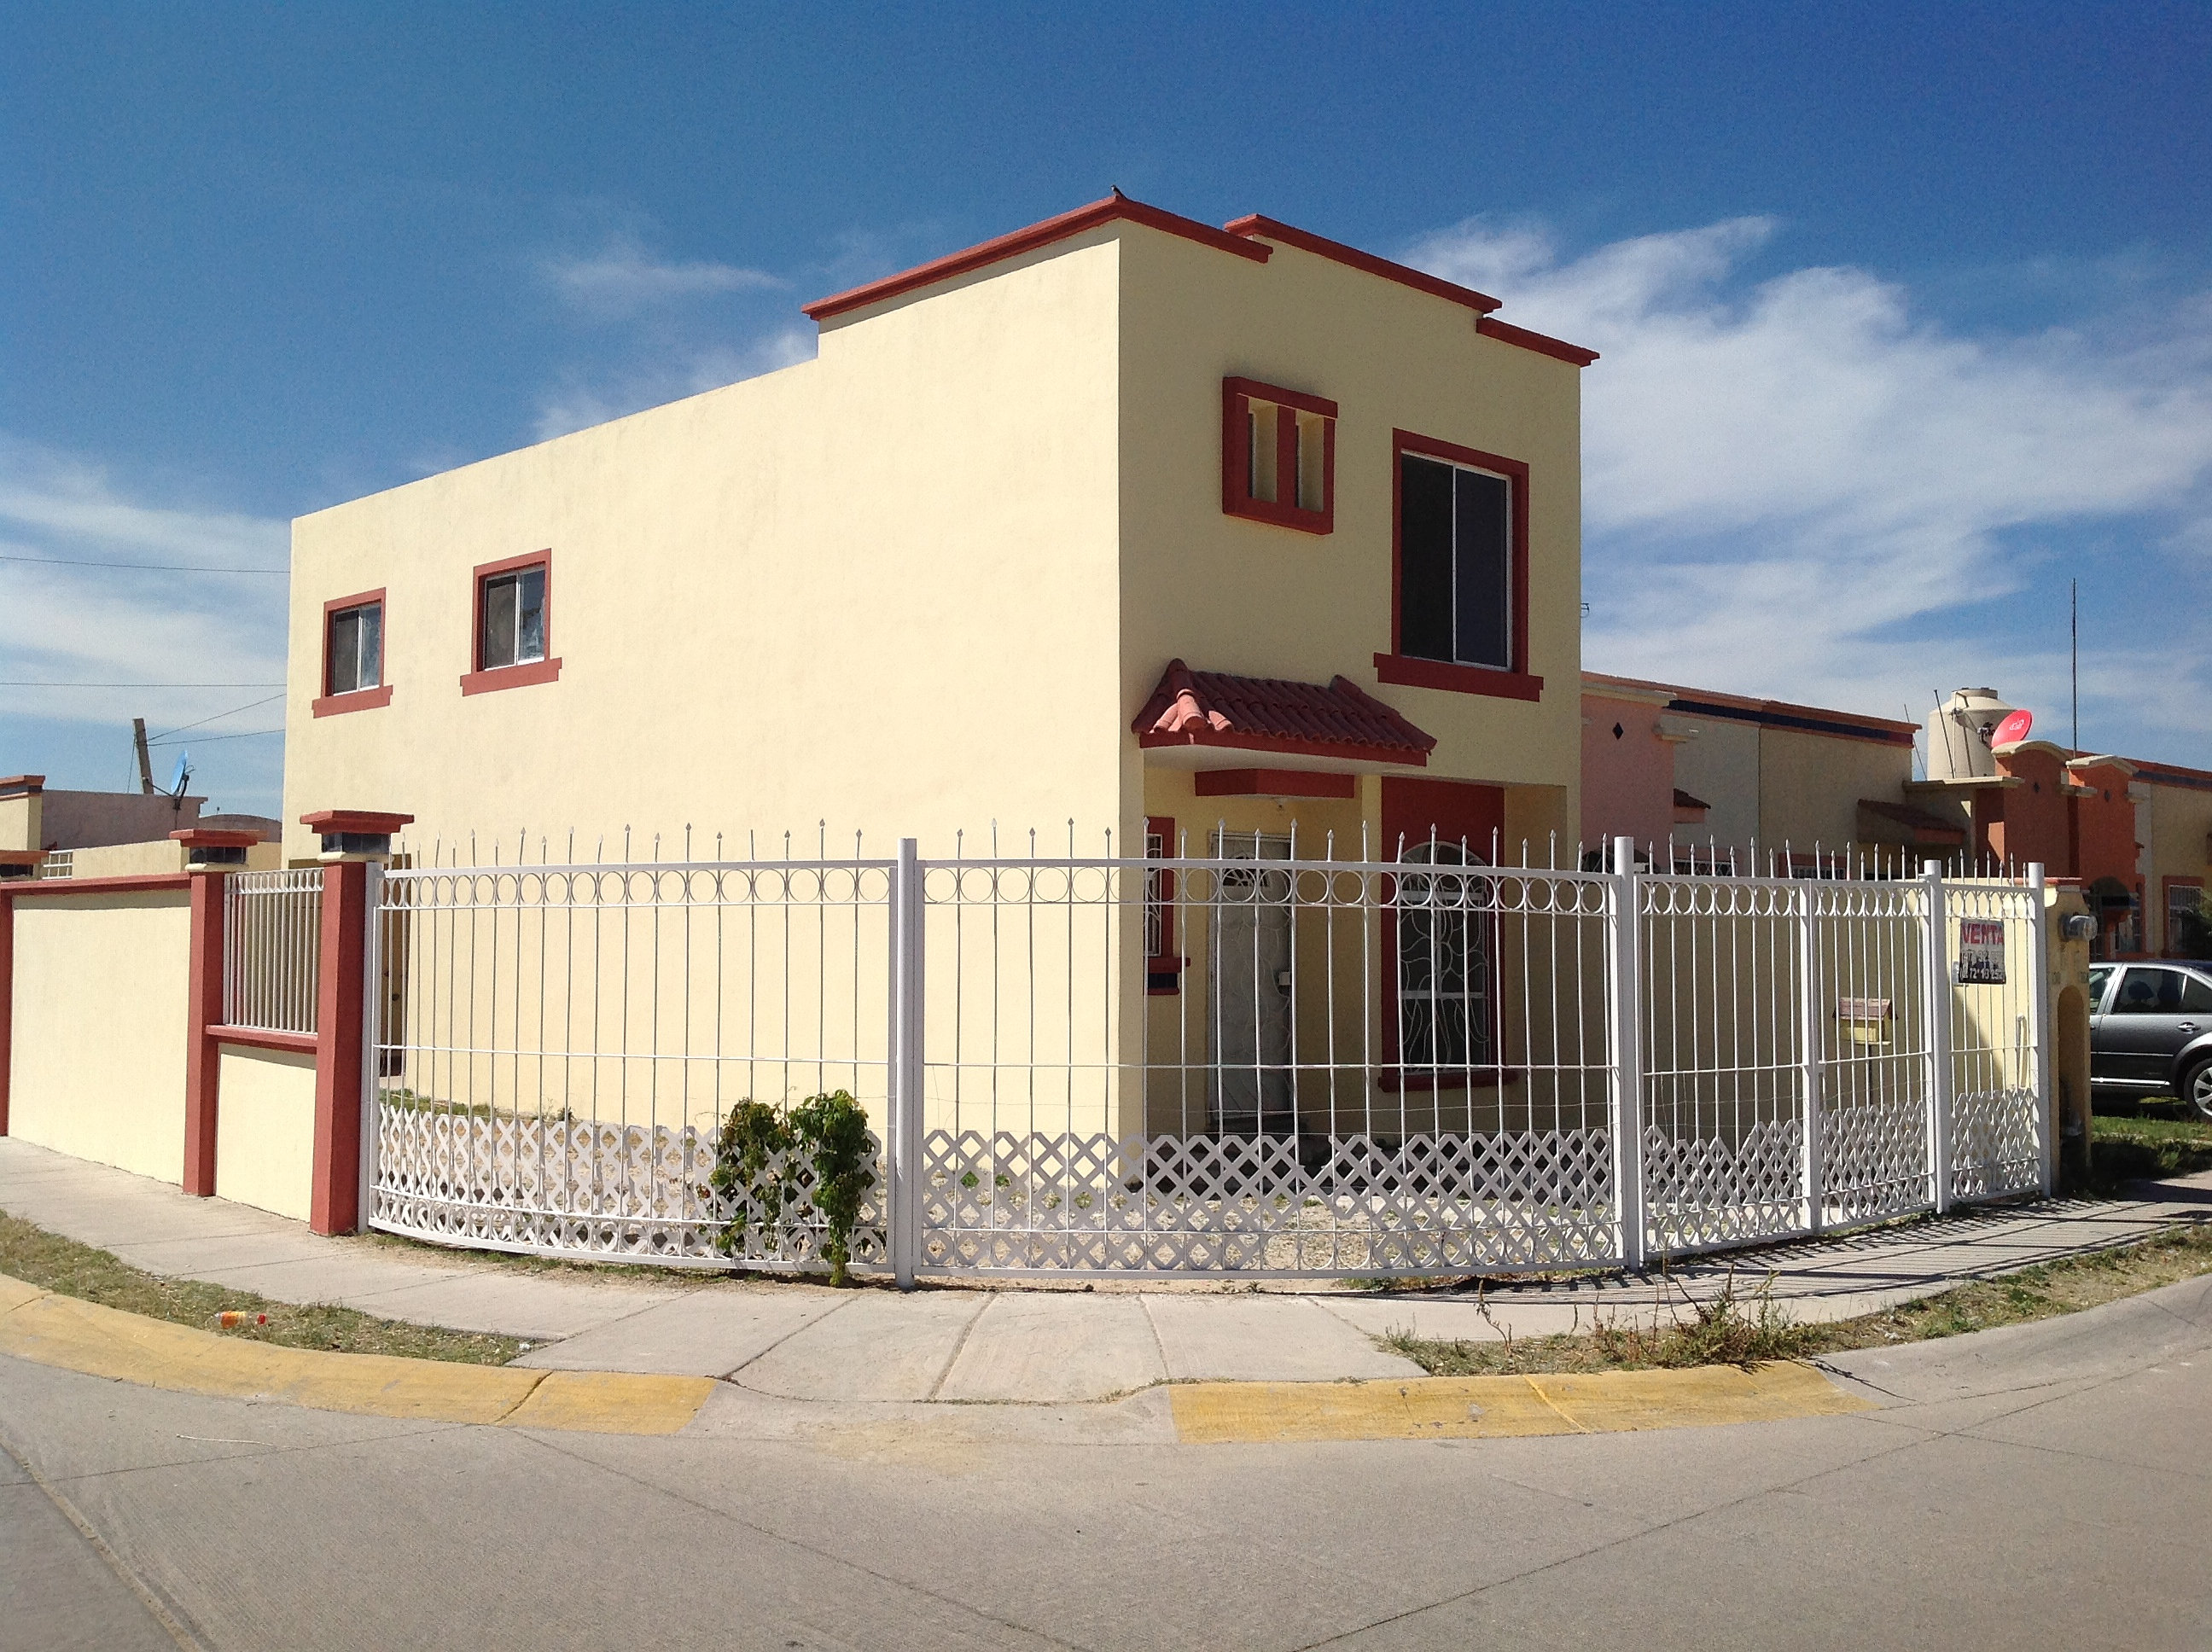 Mi casa ideal inmobiliaria leon gto mexico renta casa for Casas en renta leon gto